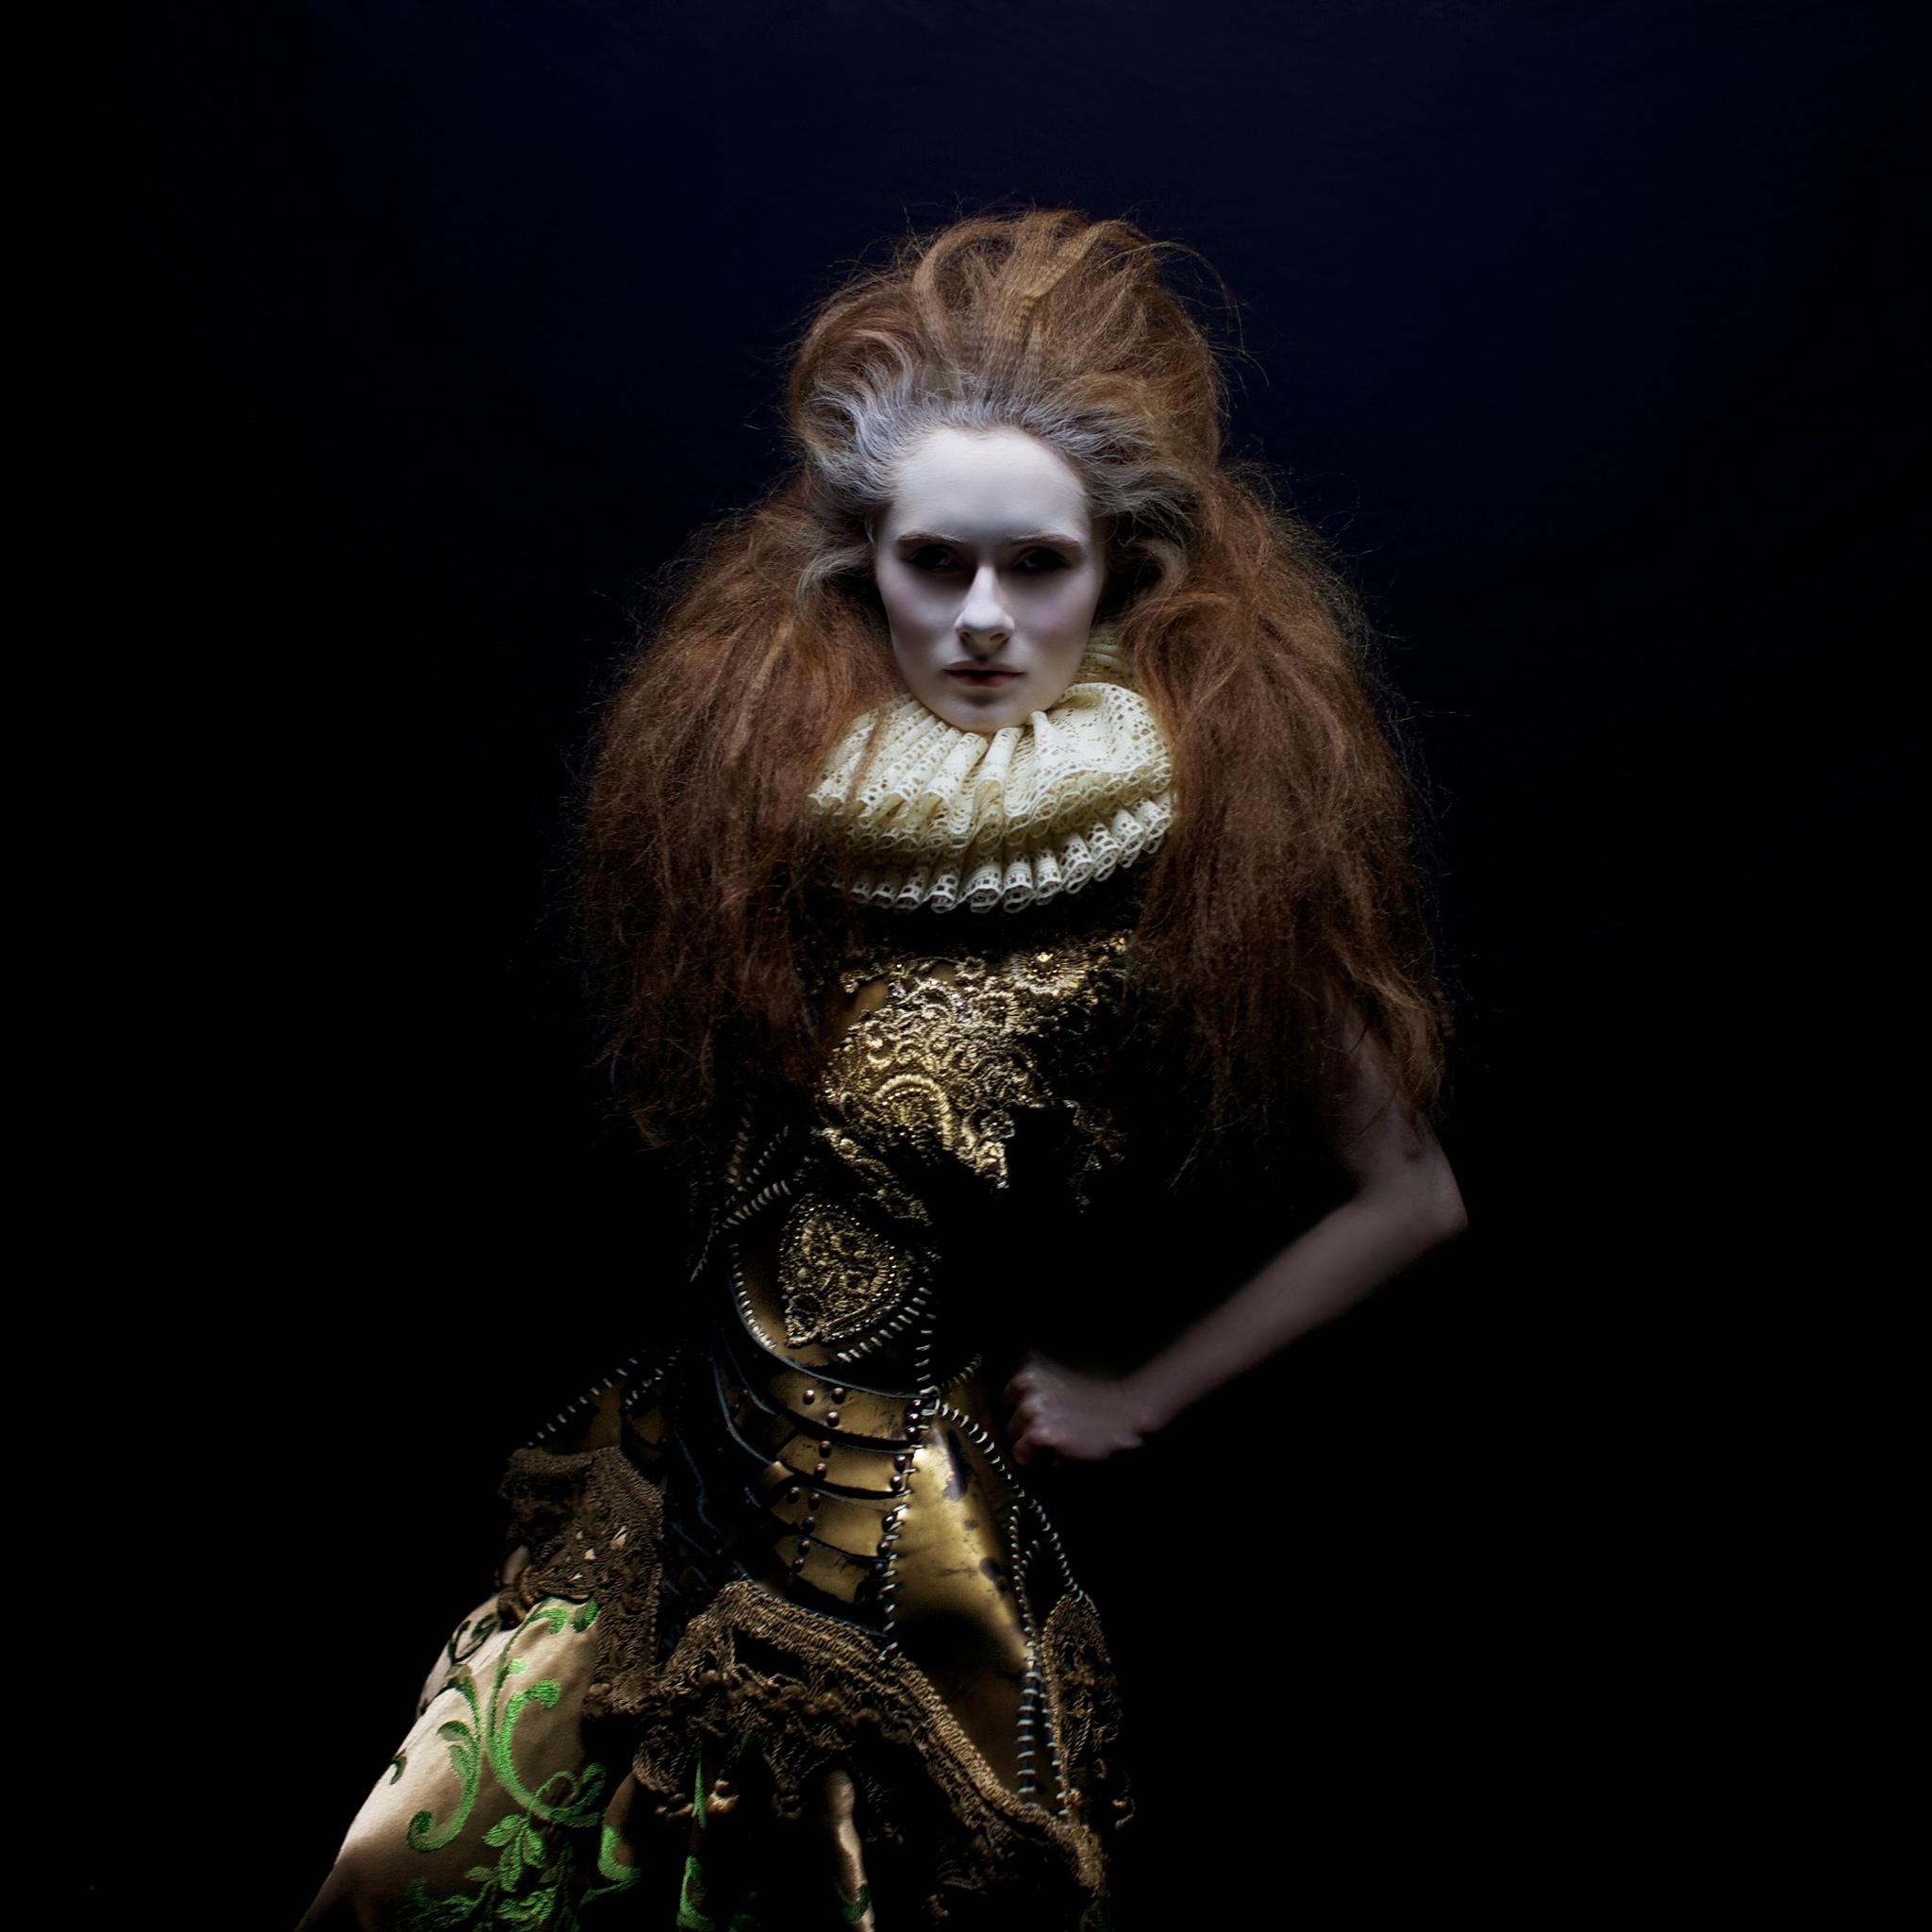 Helen Warner Photography - Tasha Swan - designer Agnieszka Osipa Costumes - Personal Armour